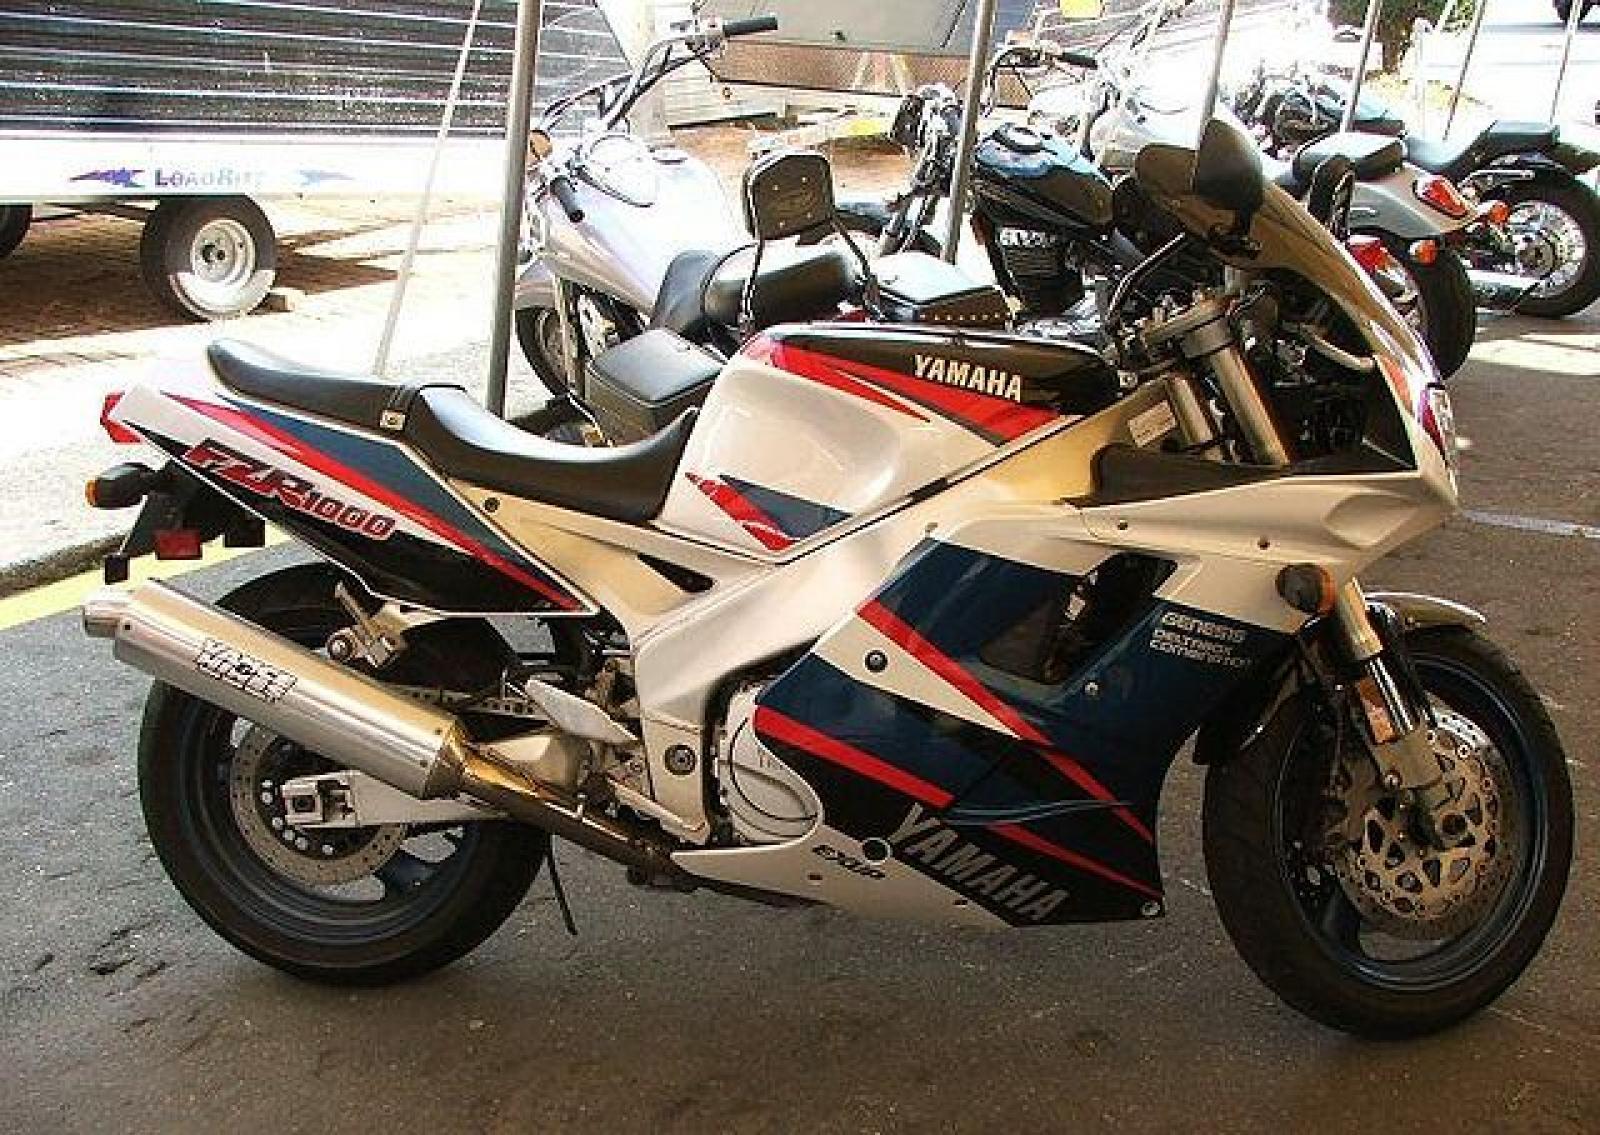 1989 Twin Headlight EXUP Yamaha FZR 1000 R 3LG1 - Front Brake Le 1000 CC